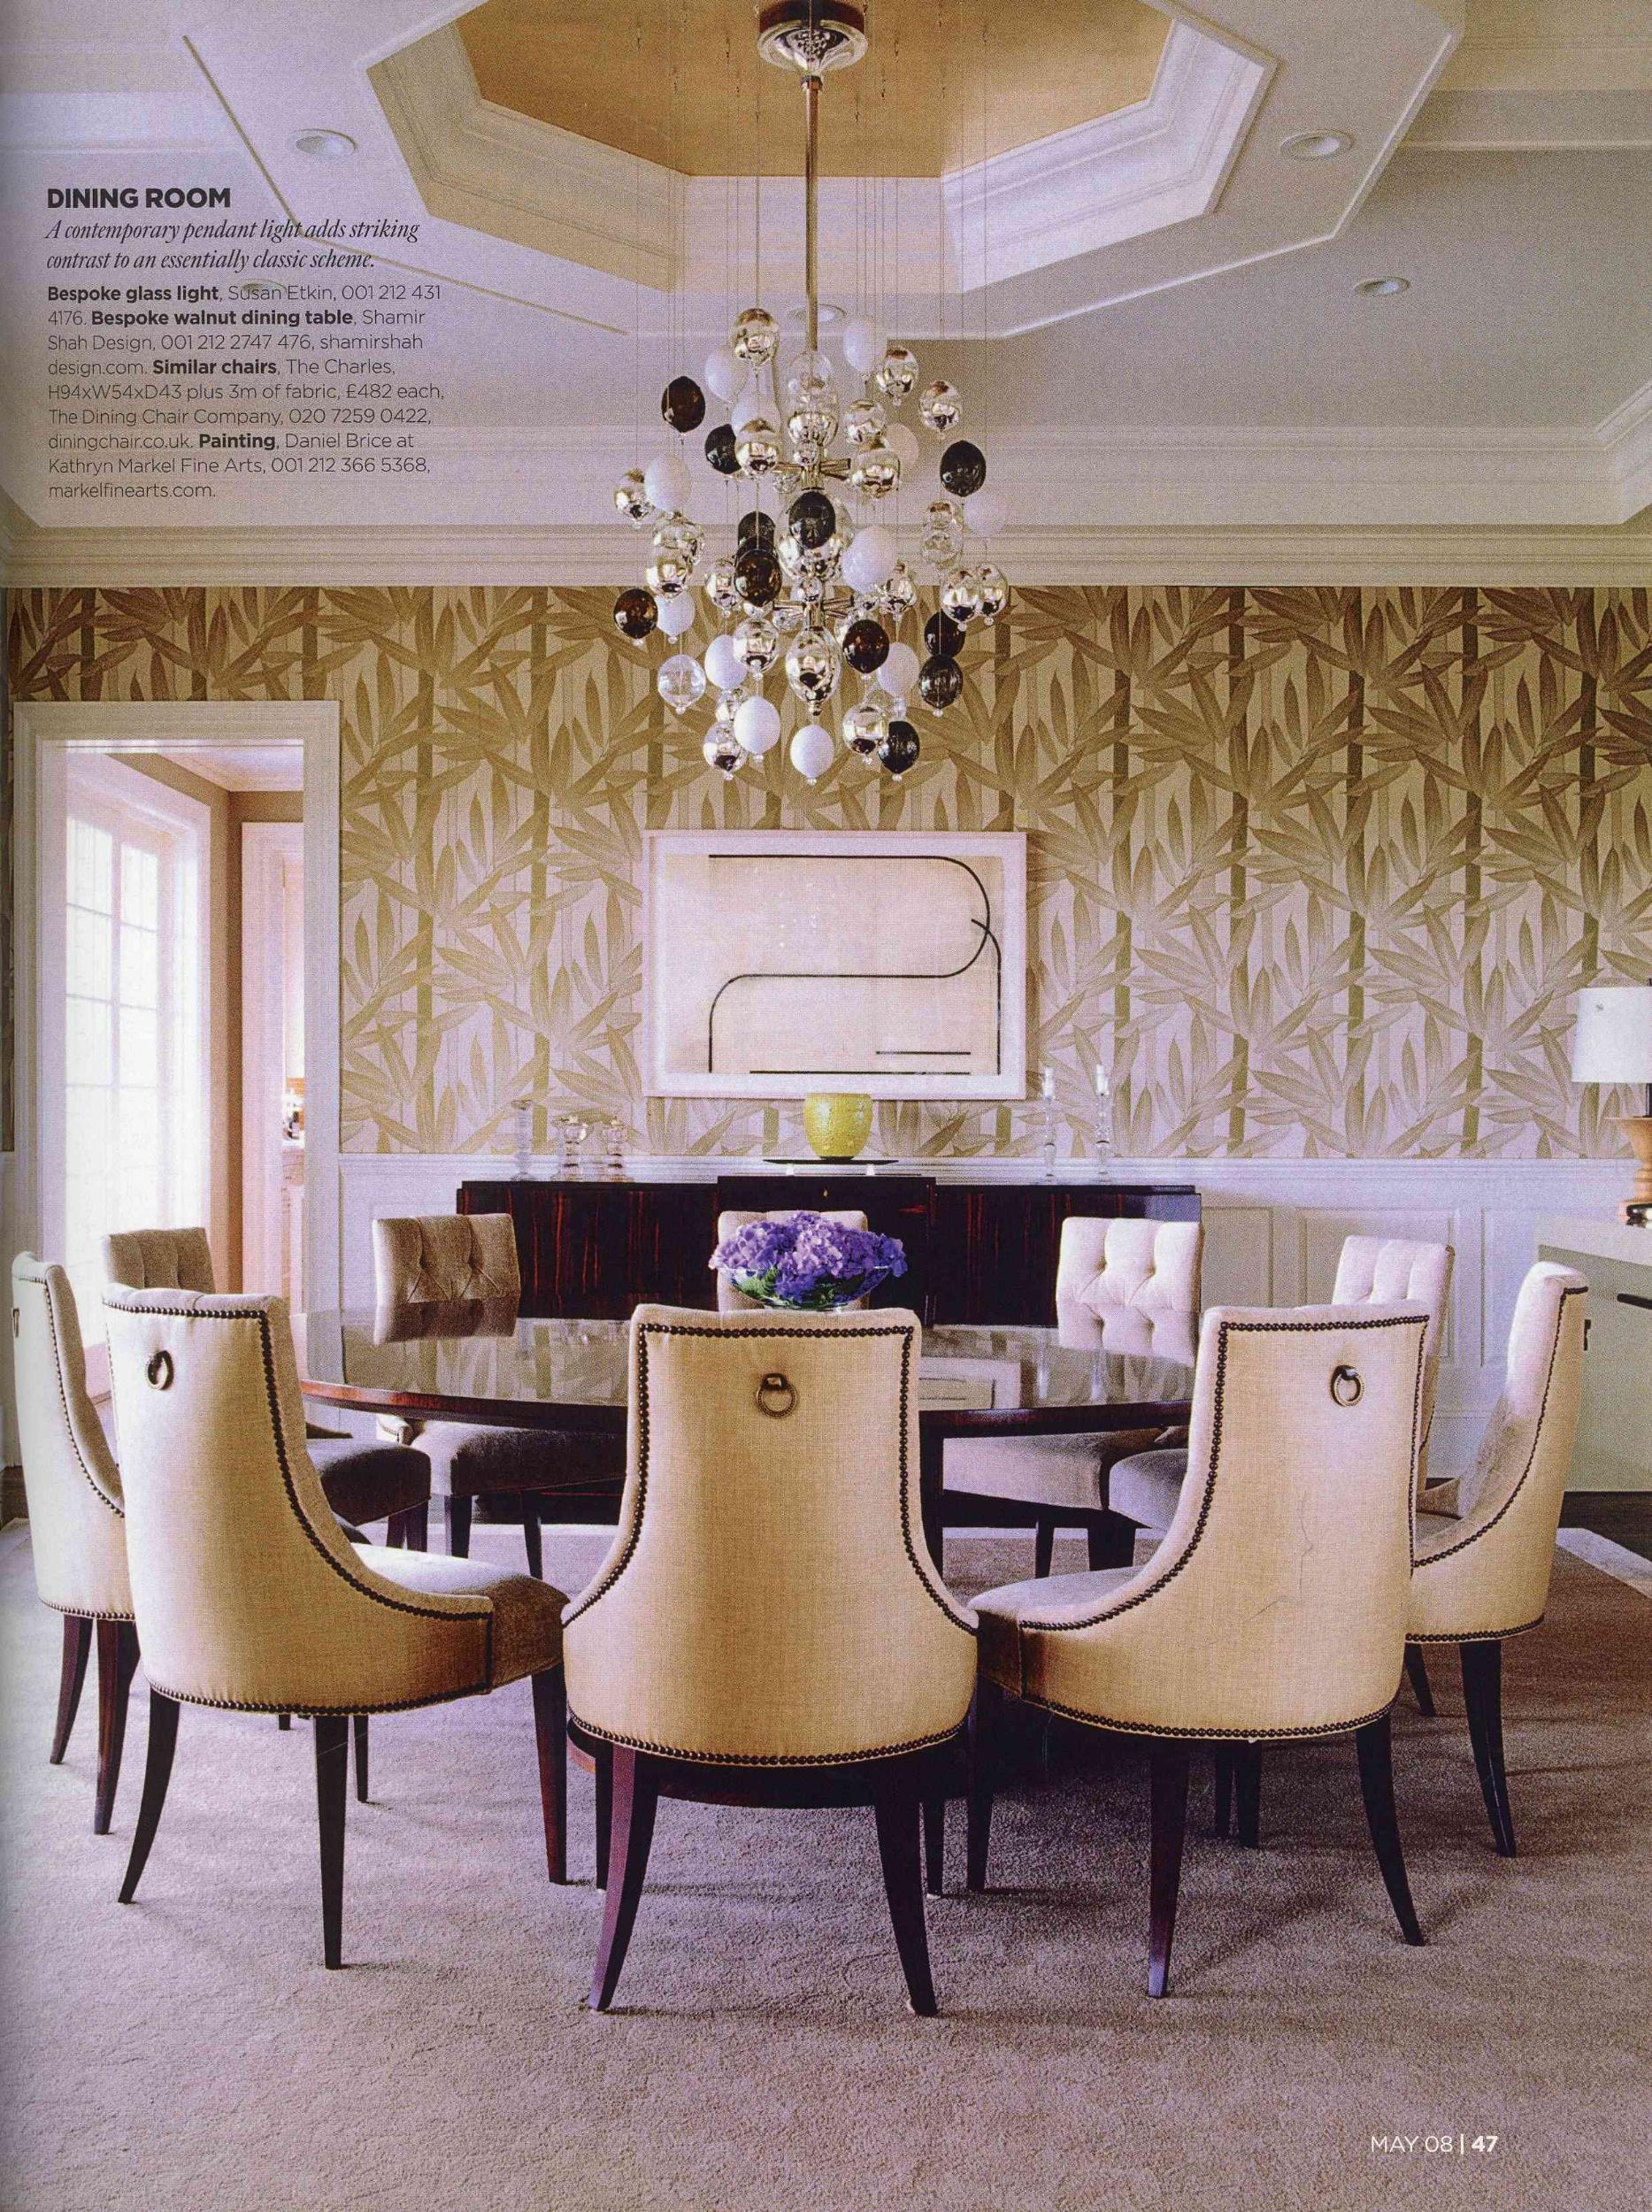 H&G May 08_Menin Hamptons_Full Article_Page_05.jpg